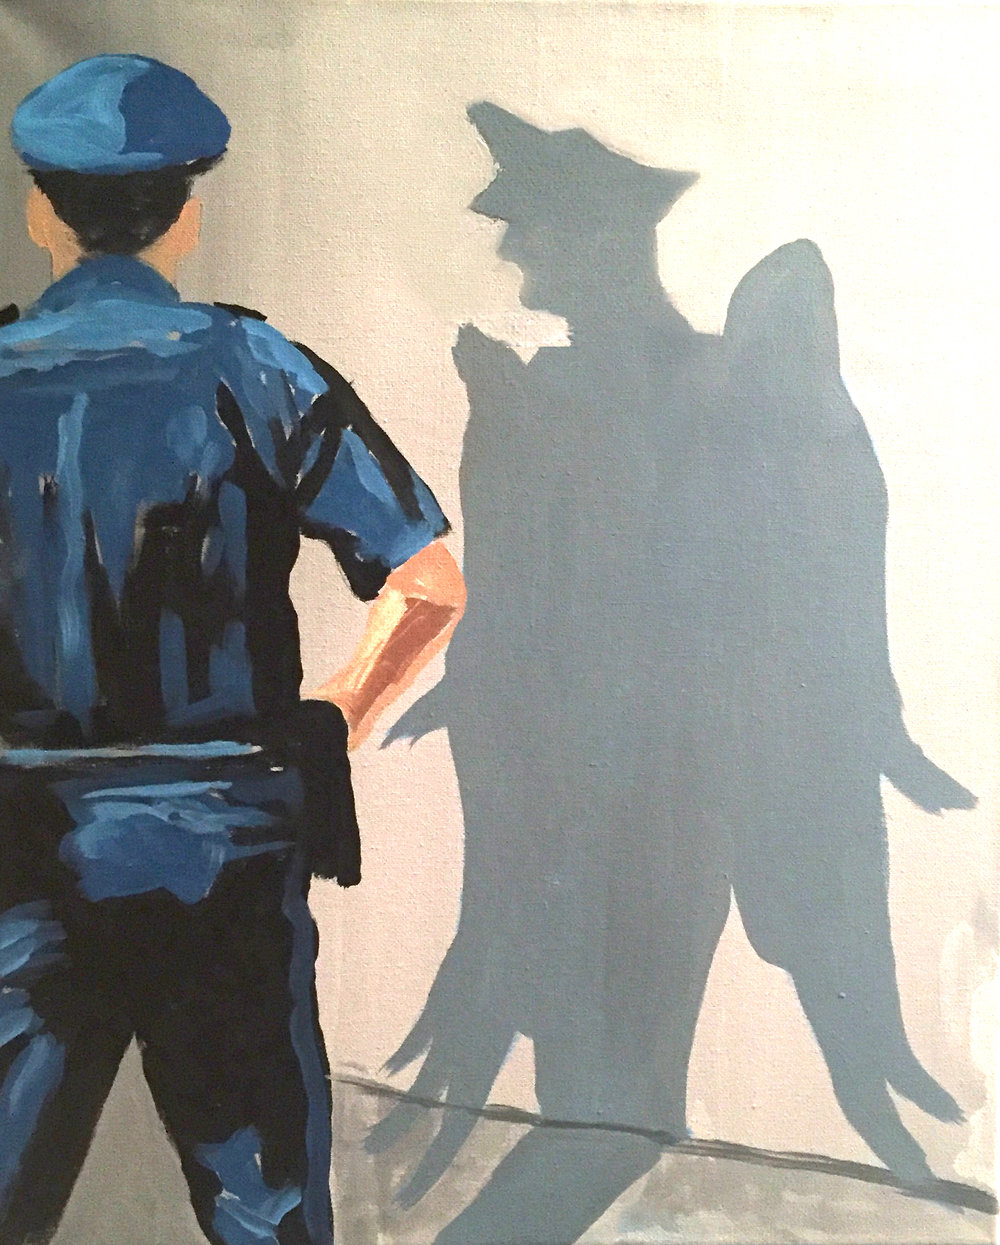 Guardian Police